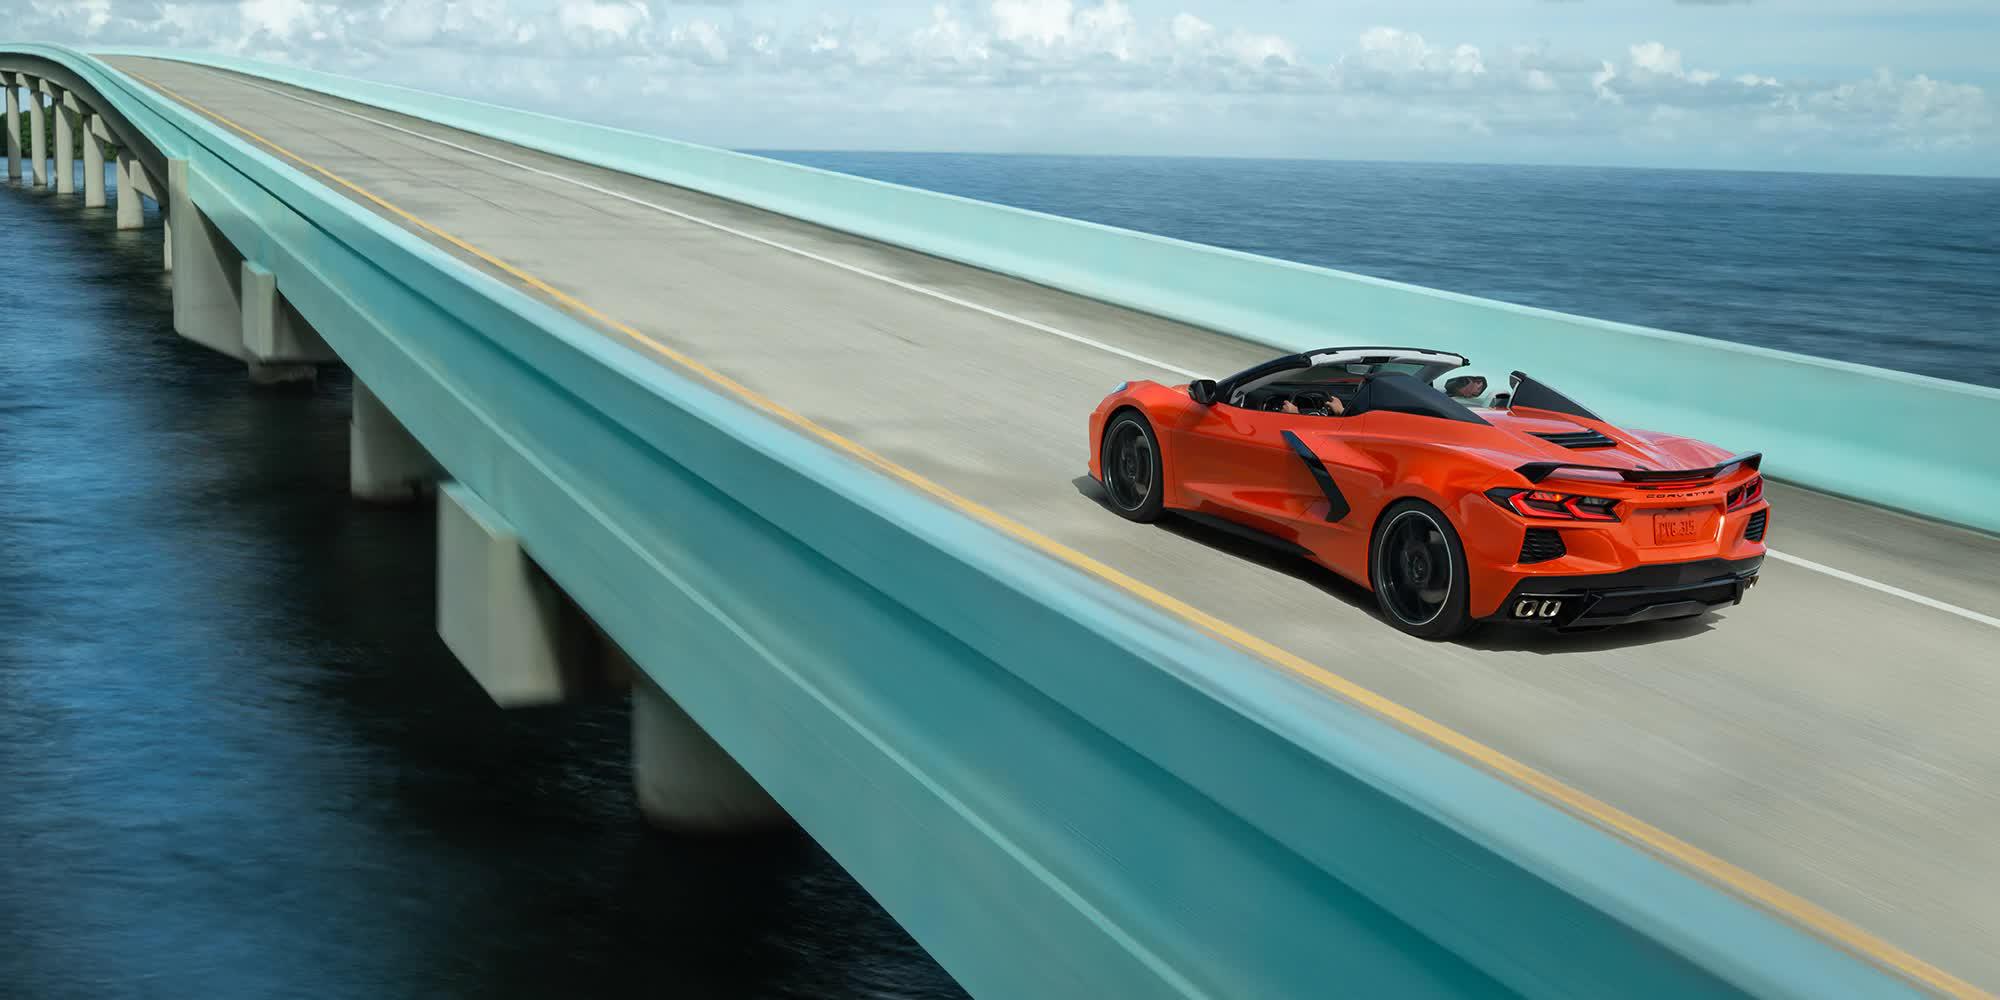 Corvette C8 Arancio